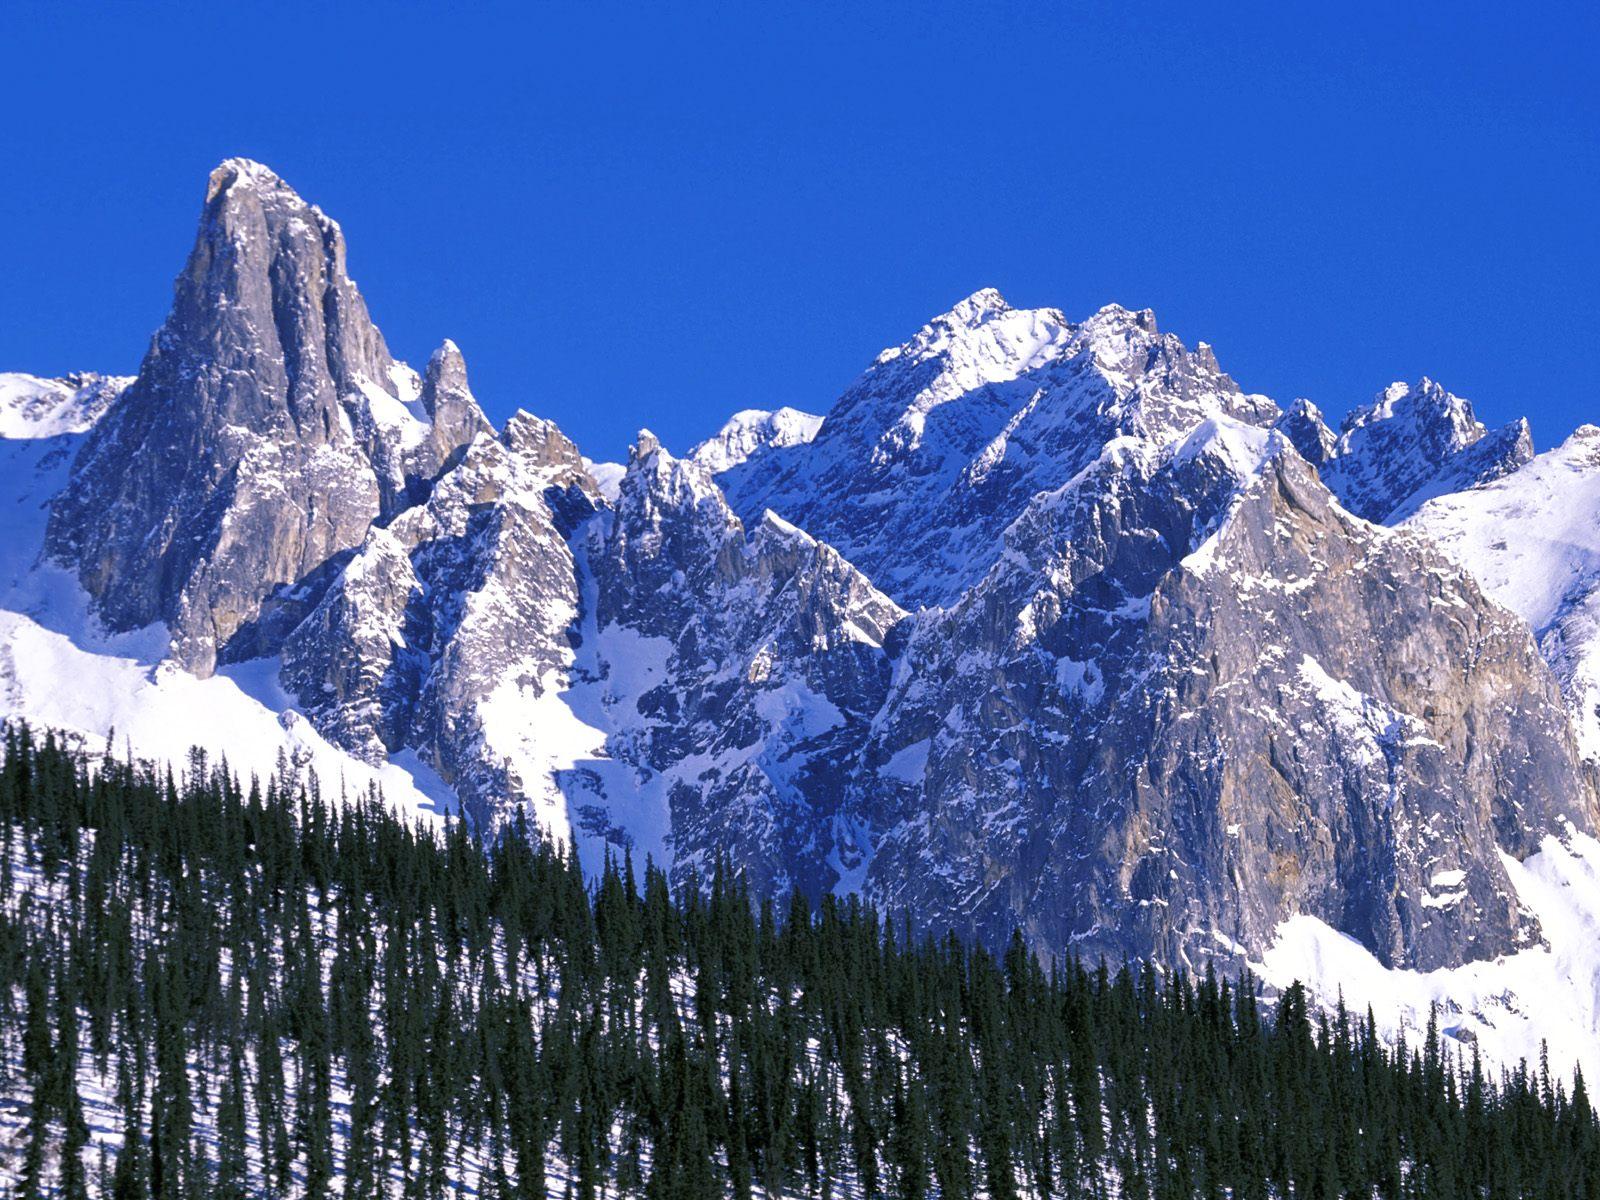 Mount Fuji Wallpaper Iphone Brooks Mountain Range Alaska Wallpapers Hd Wallpapers